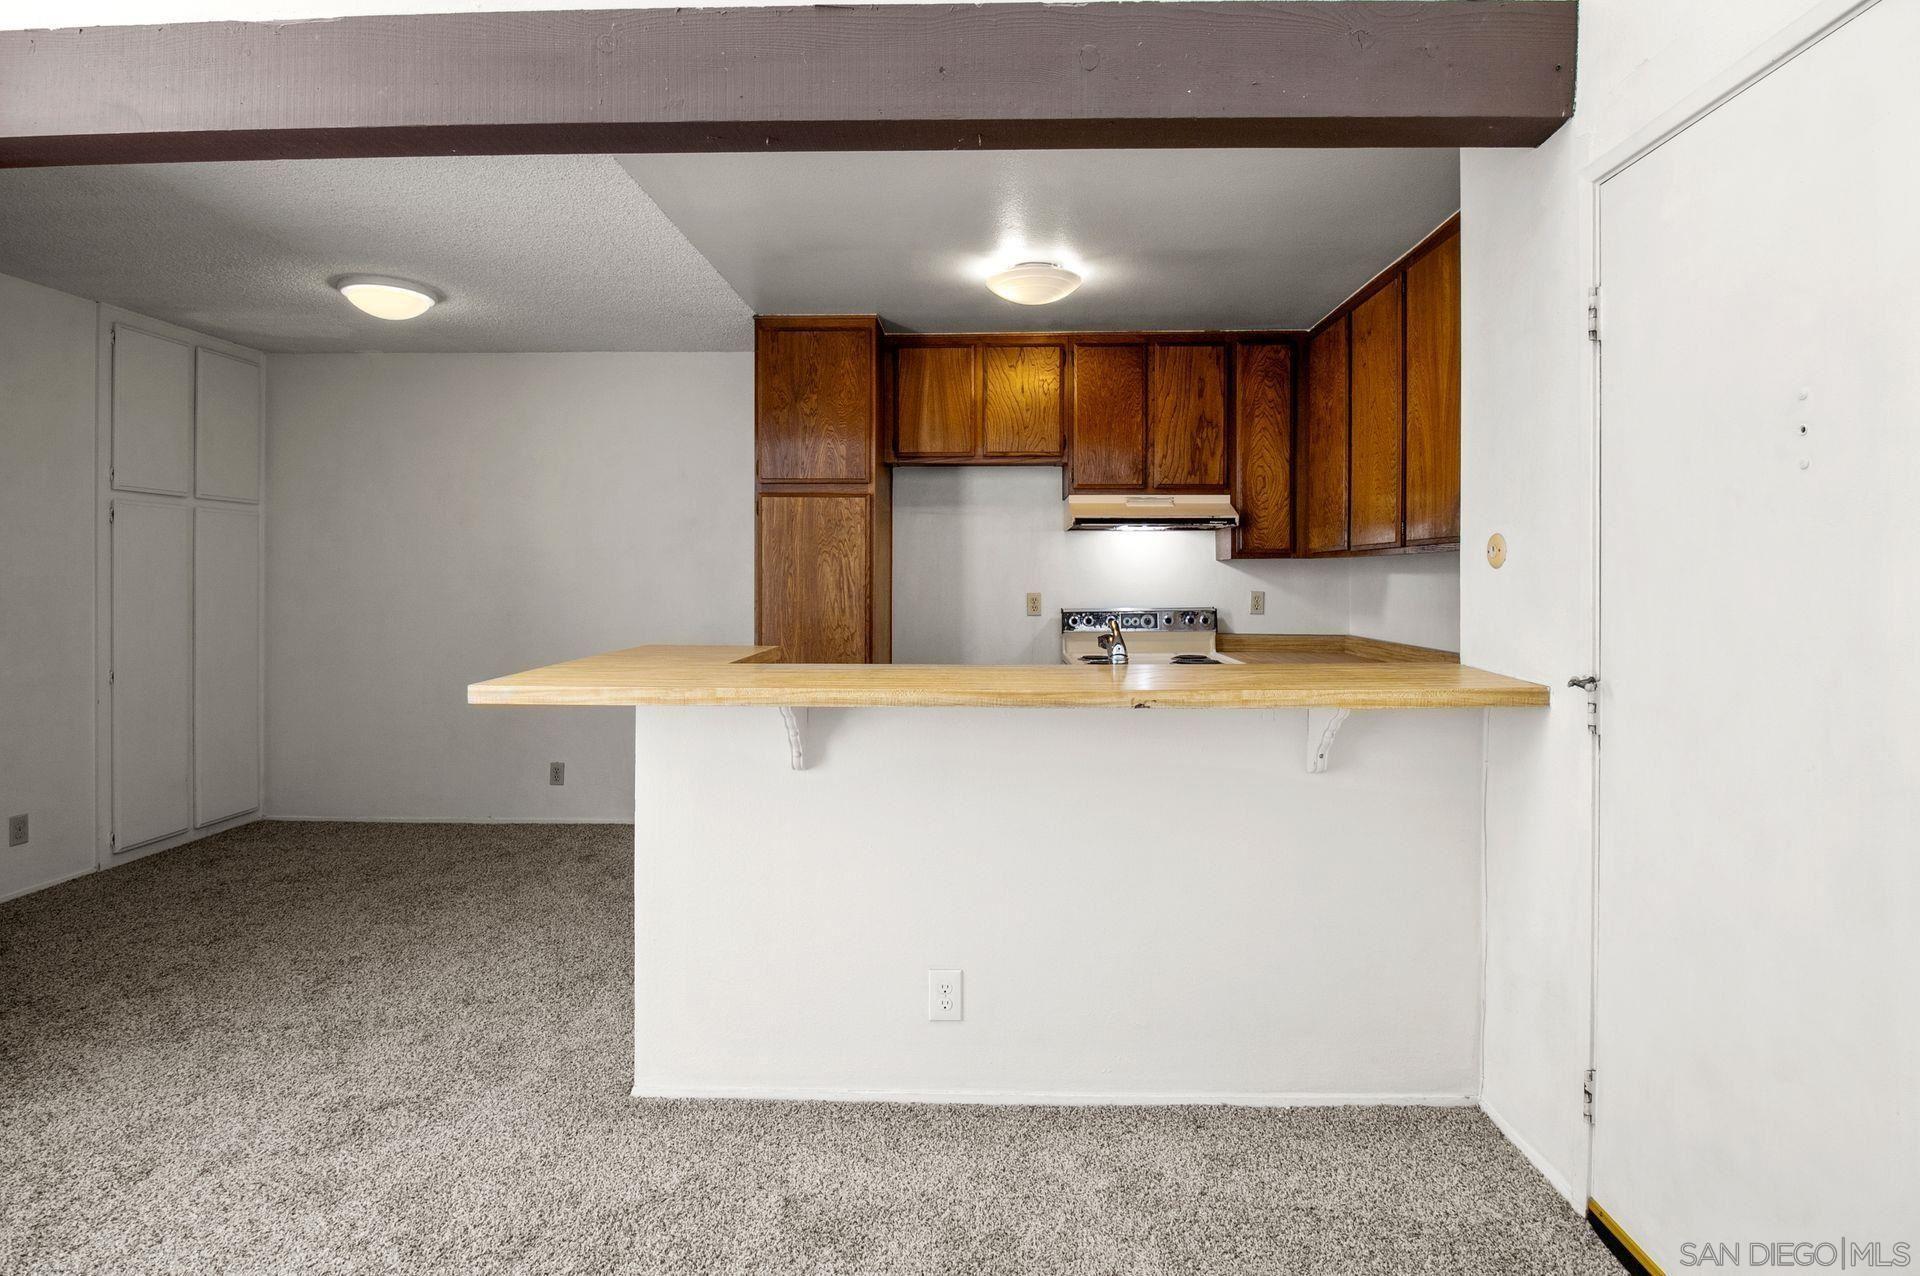 3567 Ruffin Rd #236, San Diego, CA 92123 - MLS#: 210025972